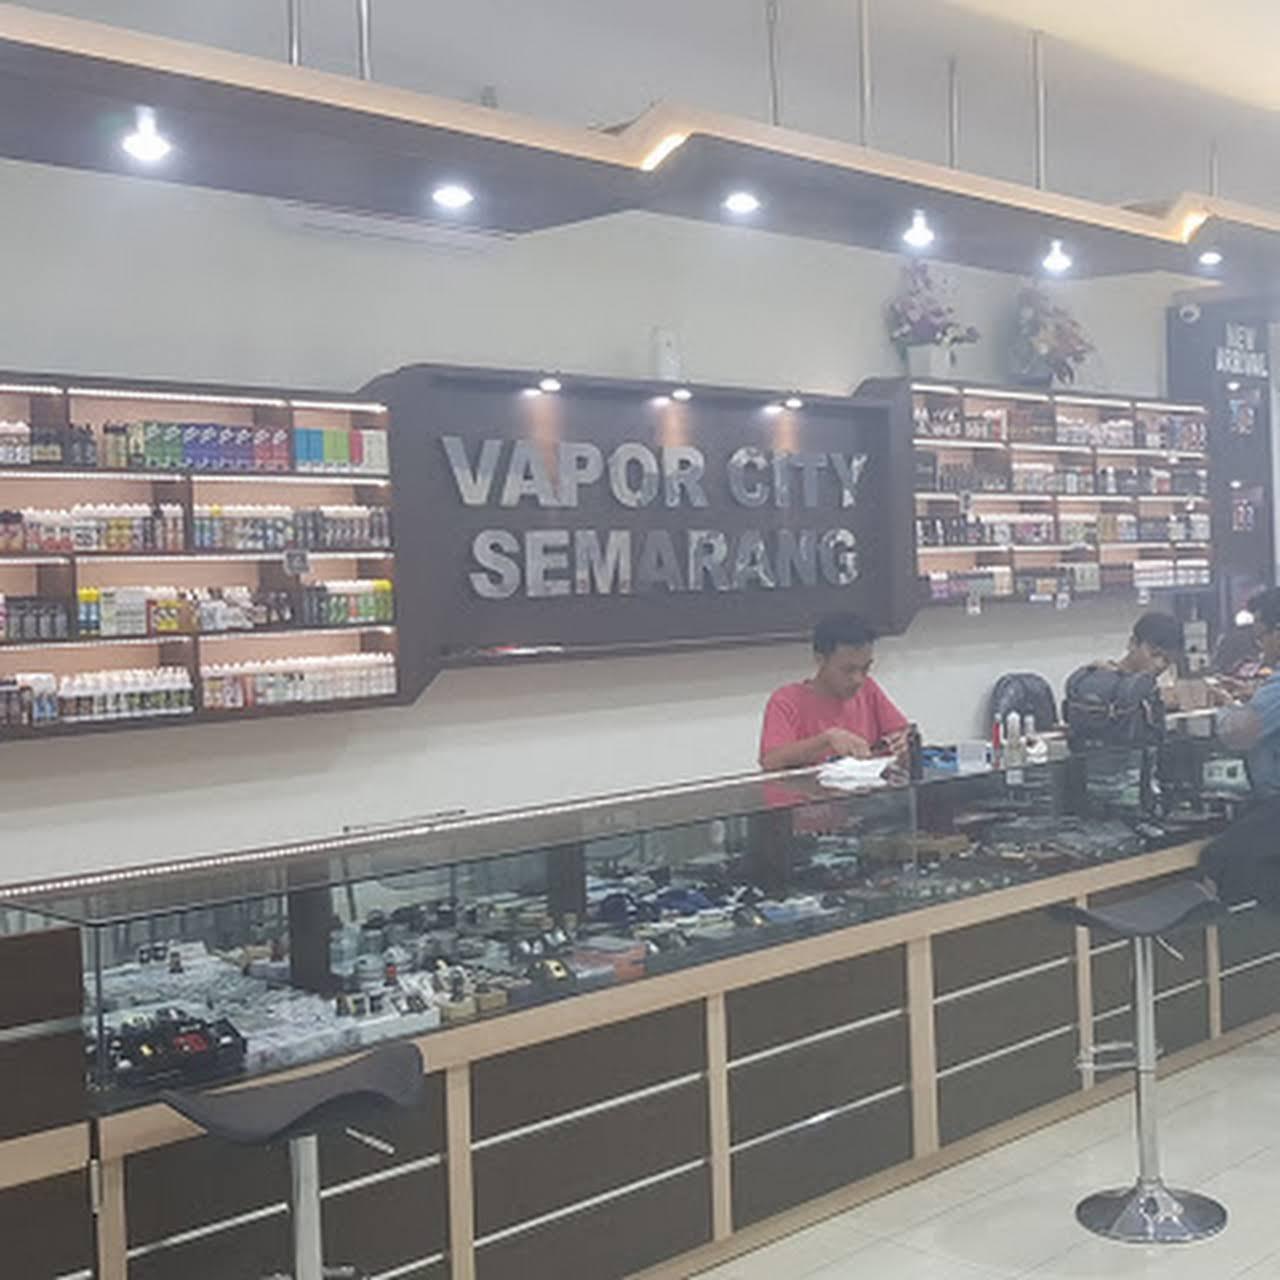 Vapor City Semarang Store Shop New Fumytech Ezipe Vape Kit 1300mah Battery Posted On Feb 12